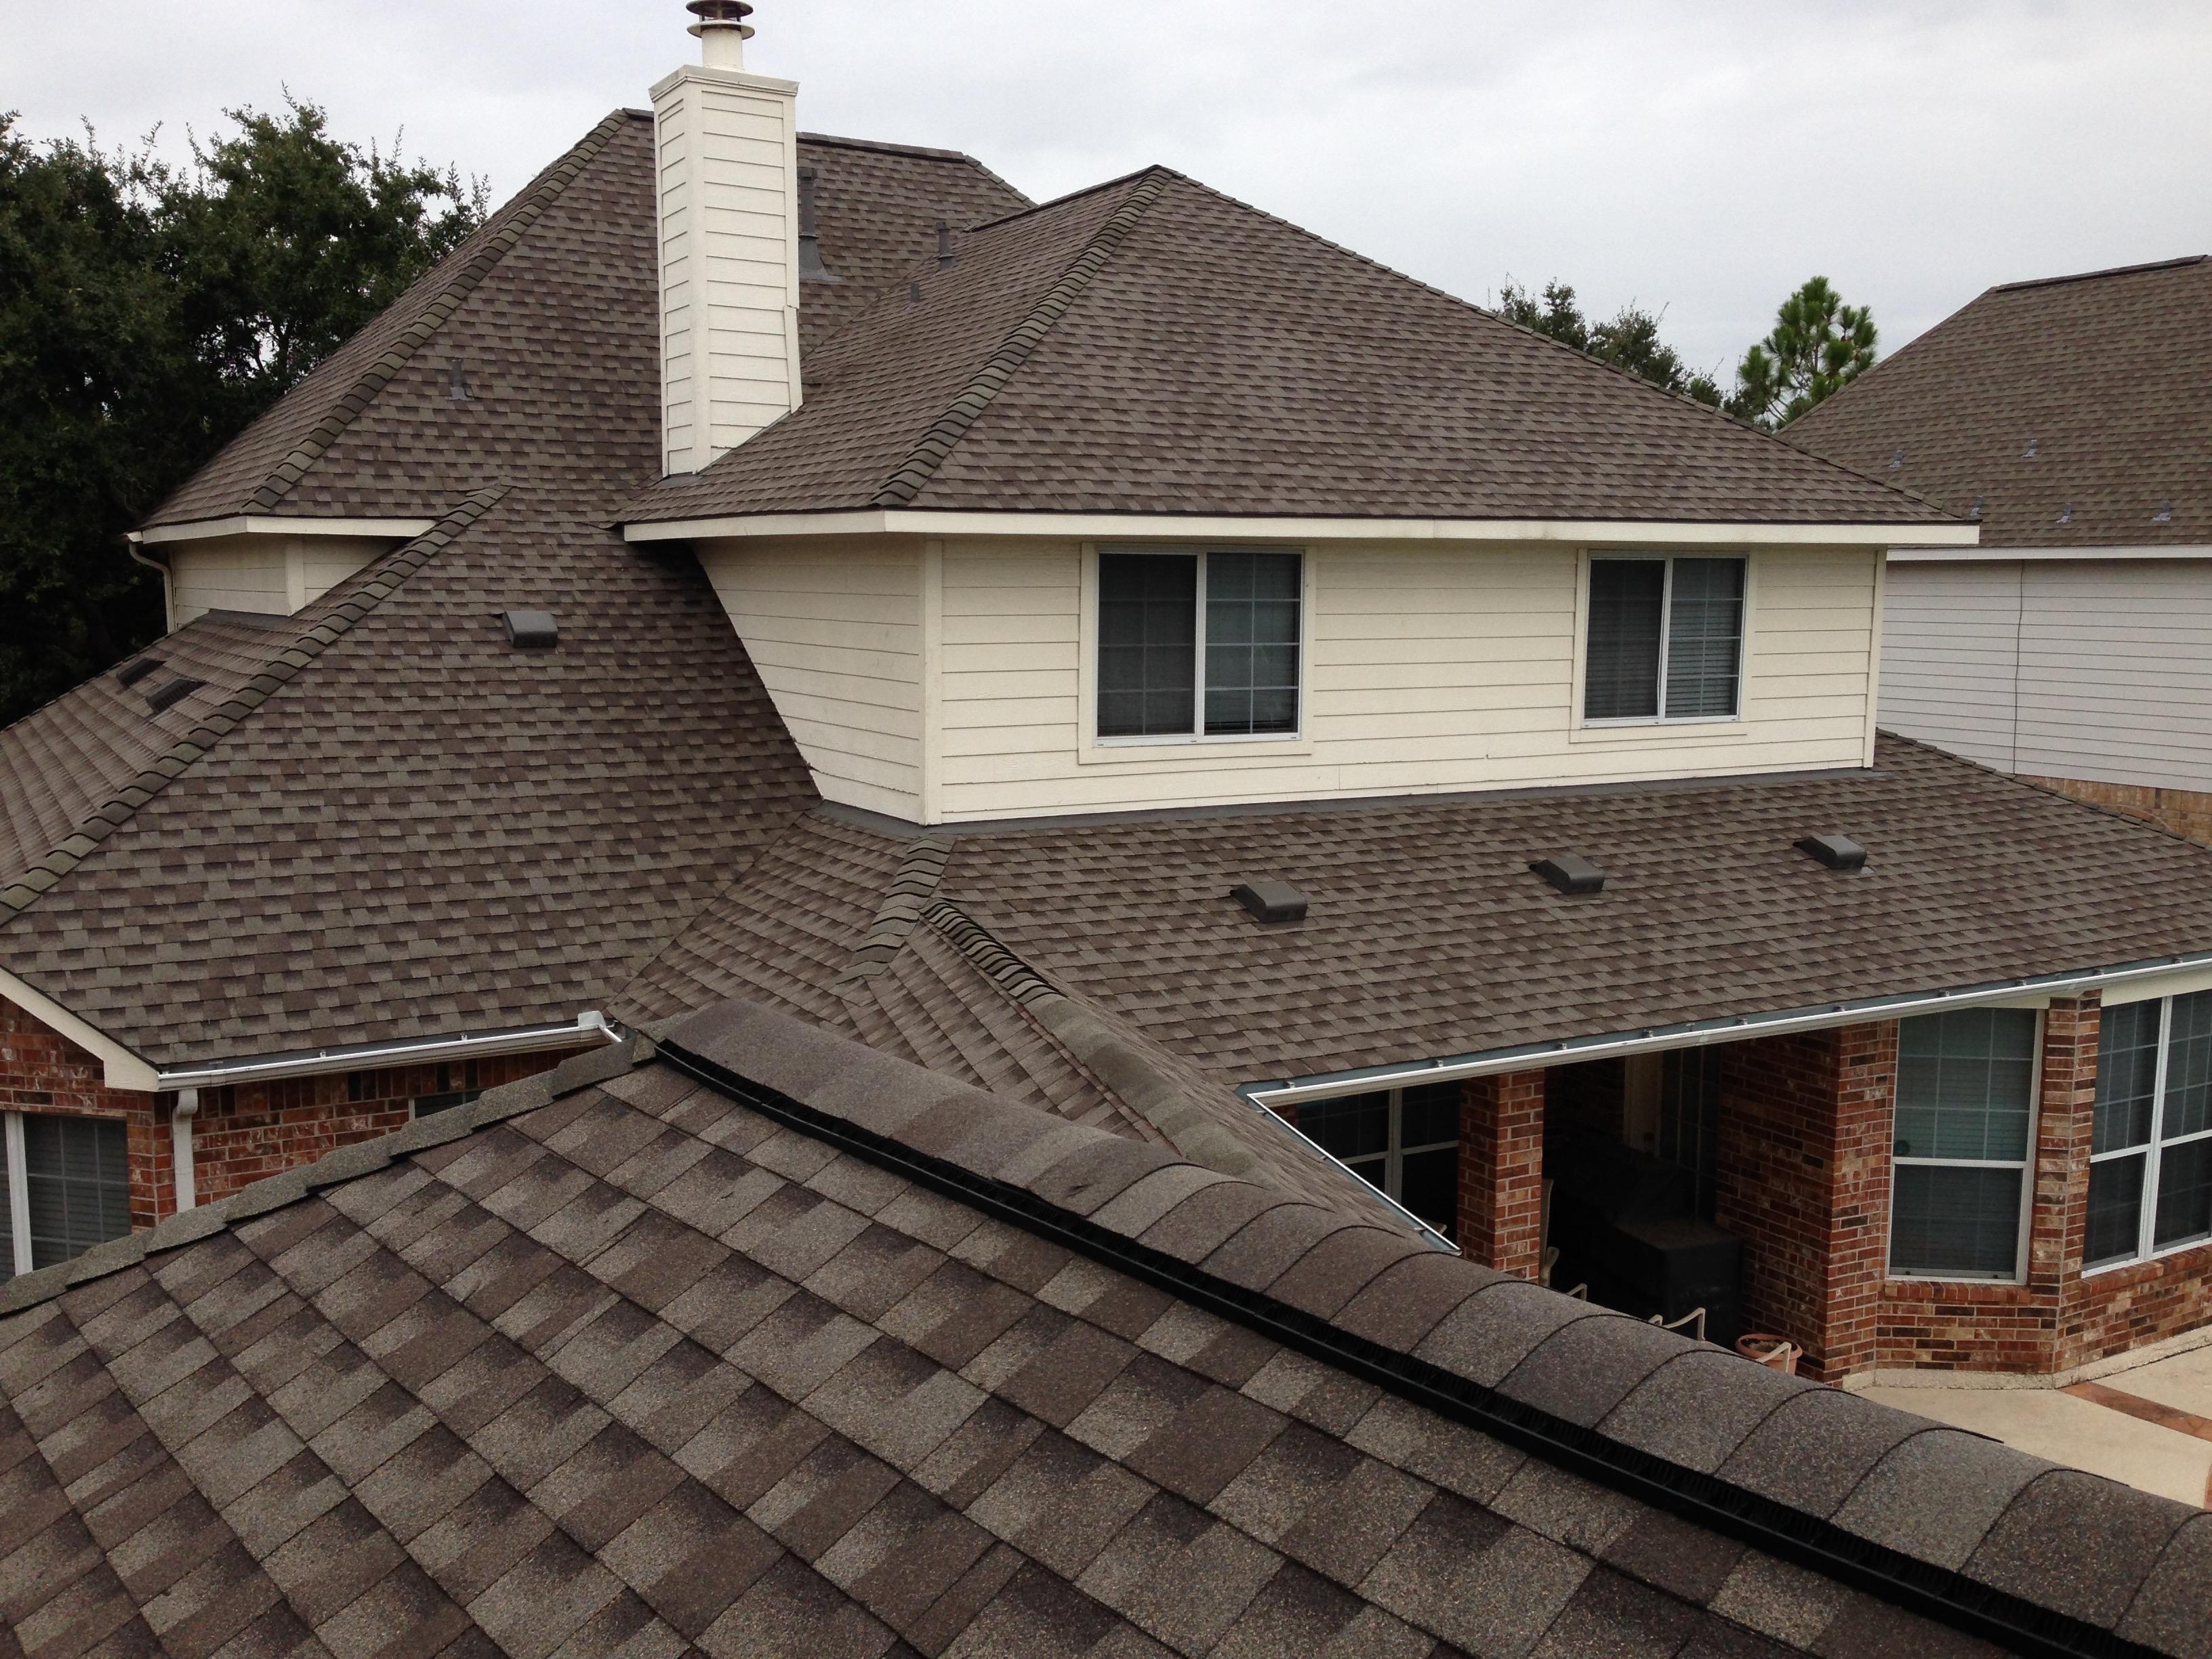 Texan Roofing image 1